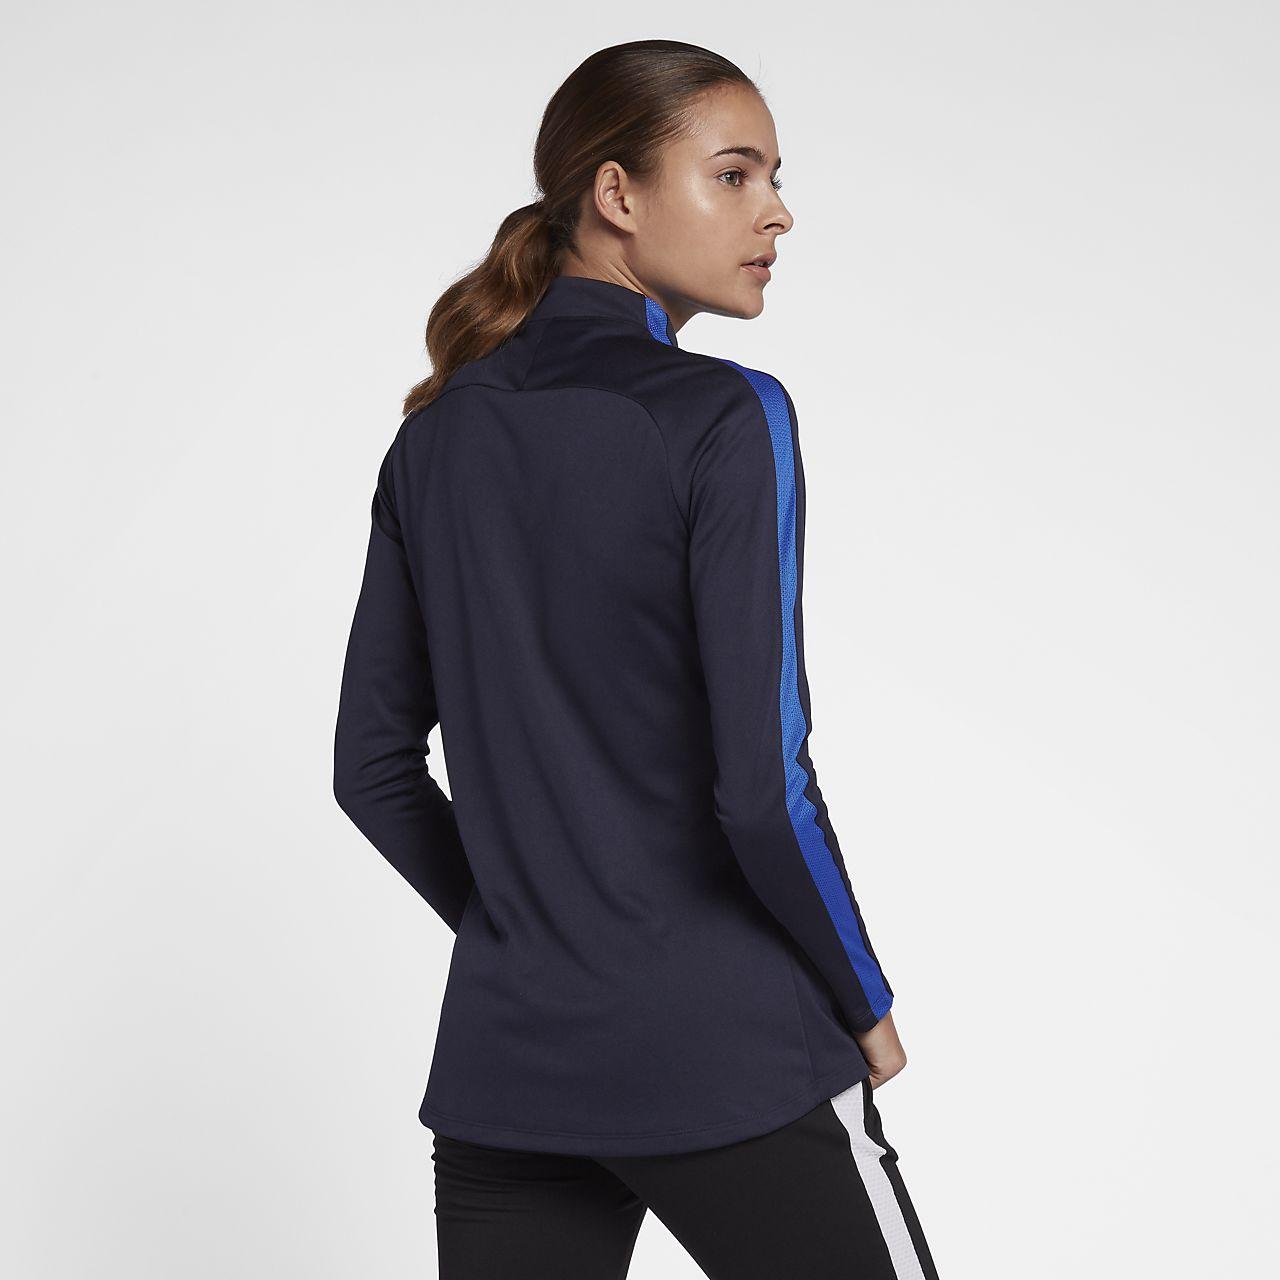 Nike Dri FIT Academy Drill Women's Long Sleeve Football Top